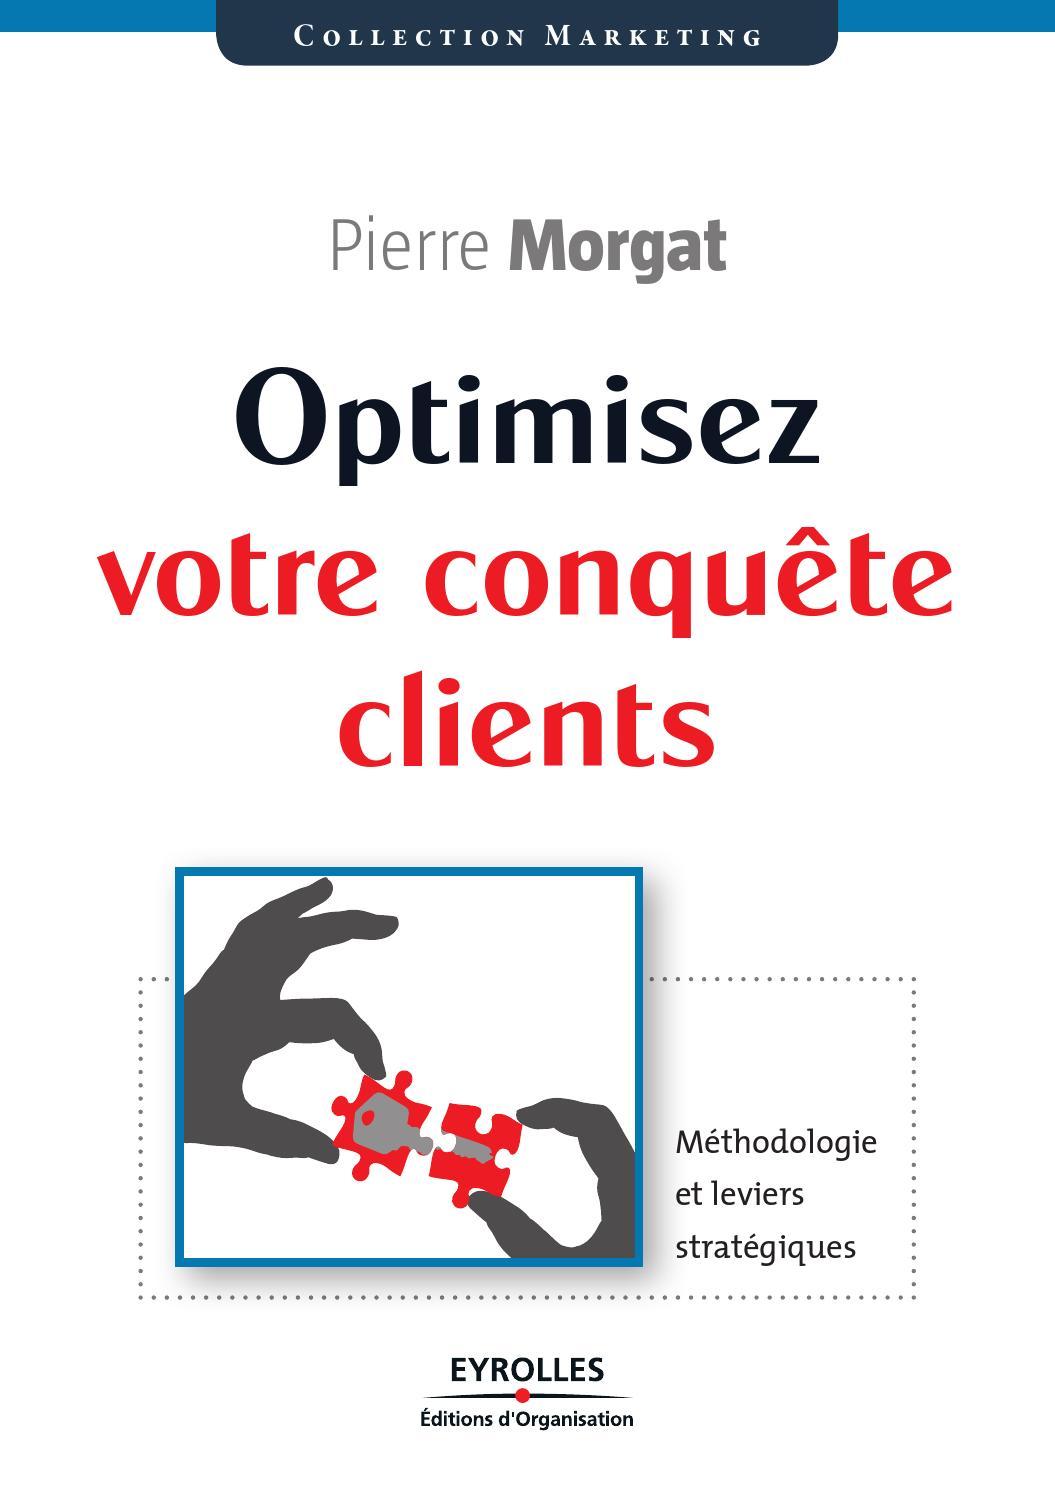 Optimisez Votre Conquete Clients By B Home Issuu